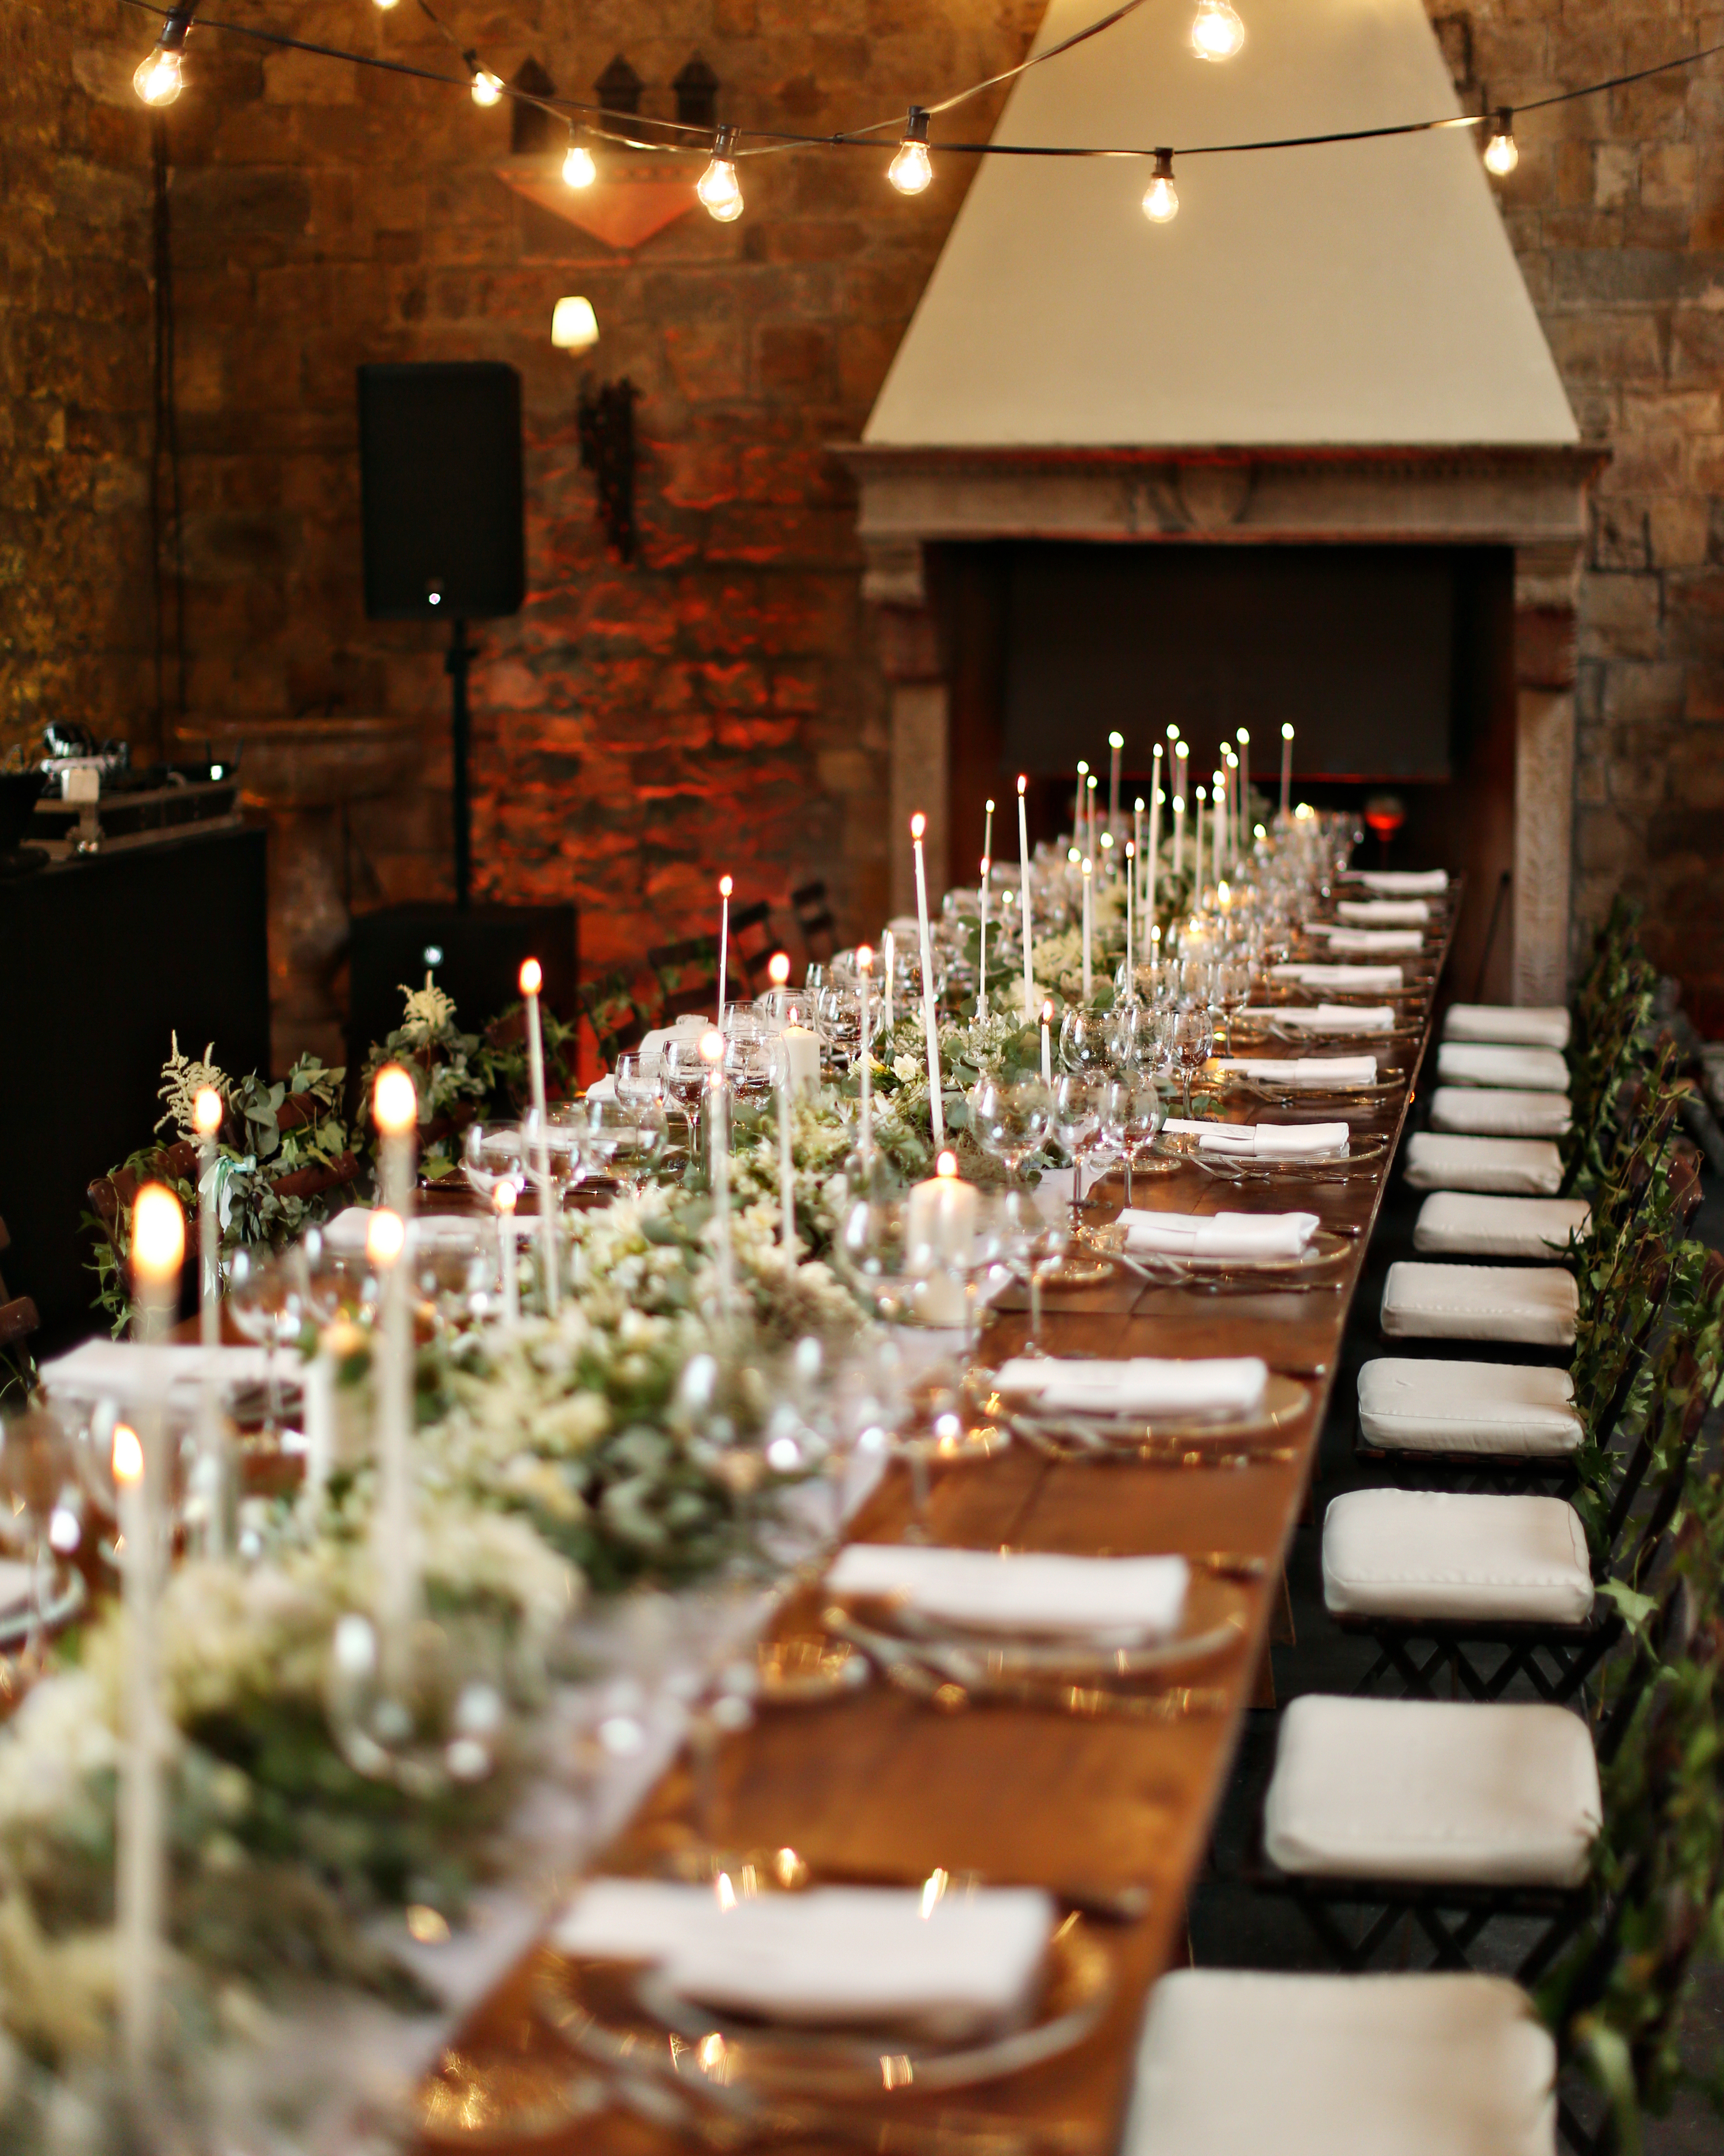 lindsay-andy-wedding-table-8169-s111659-1114.jpg